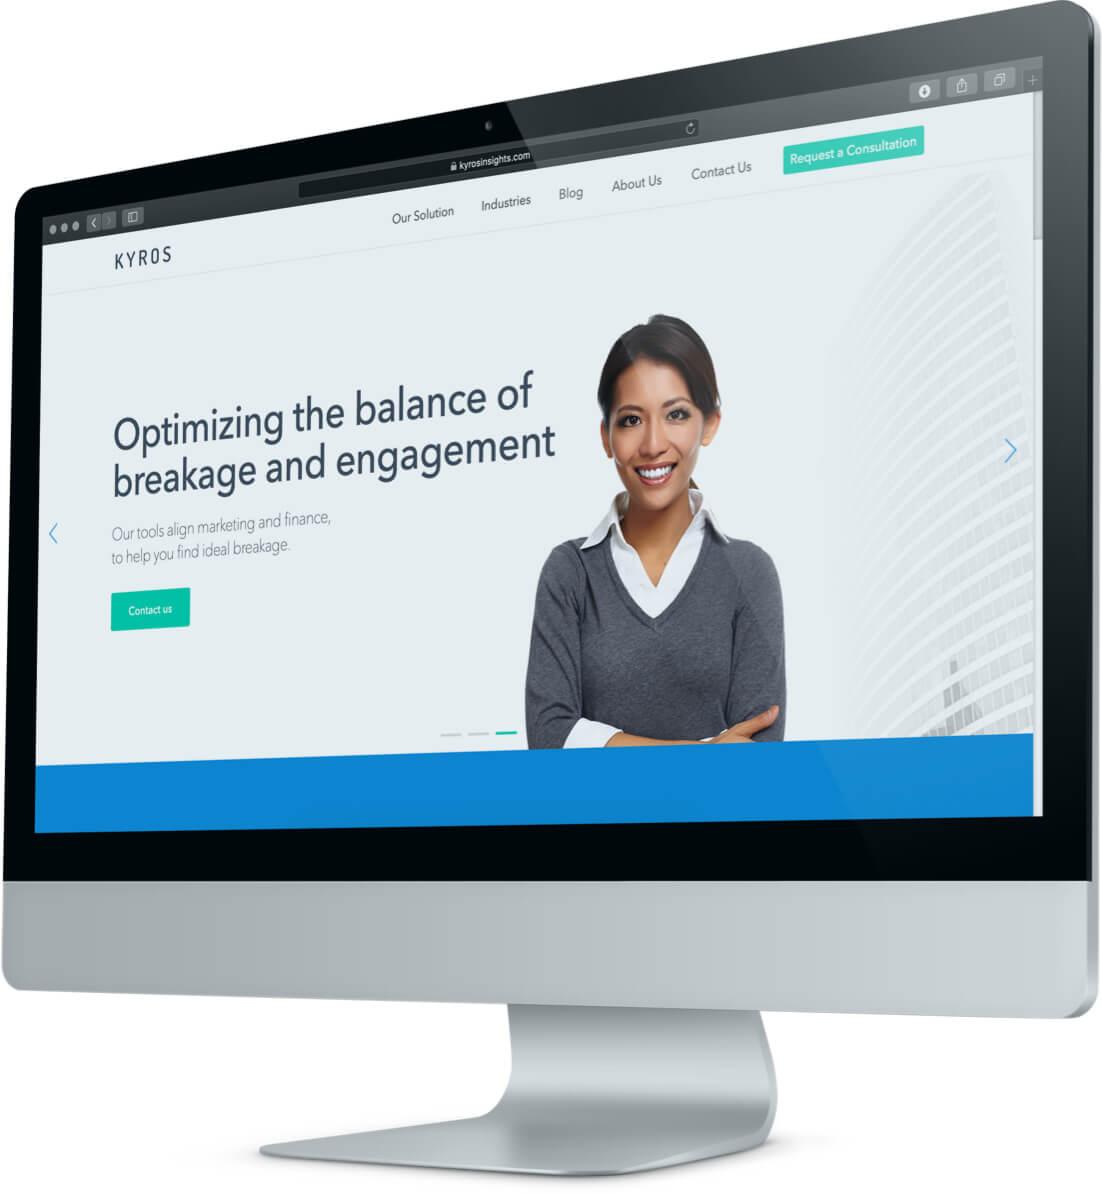 Kyros' website shown on a desktop